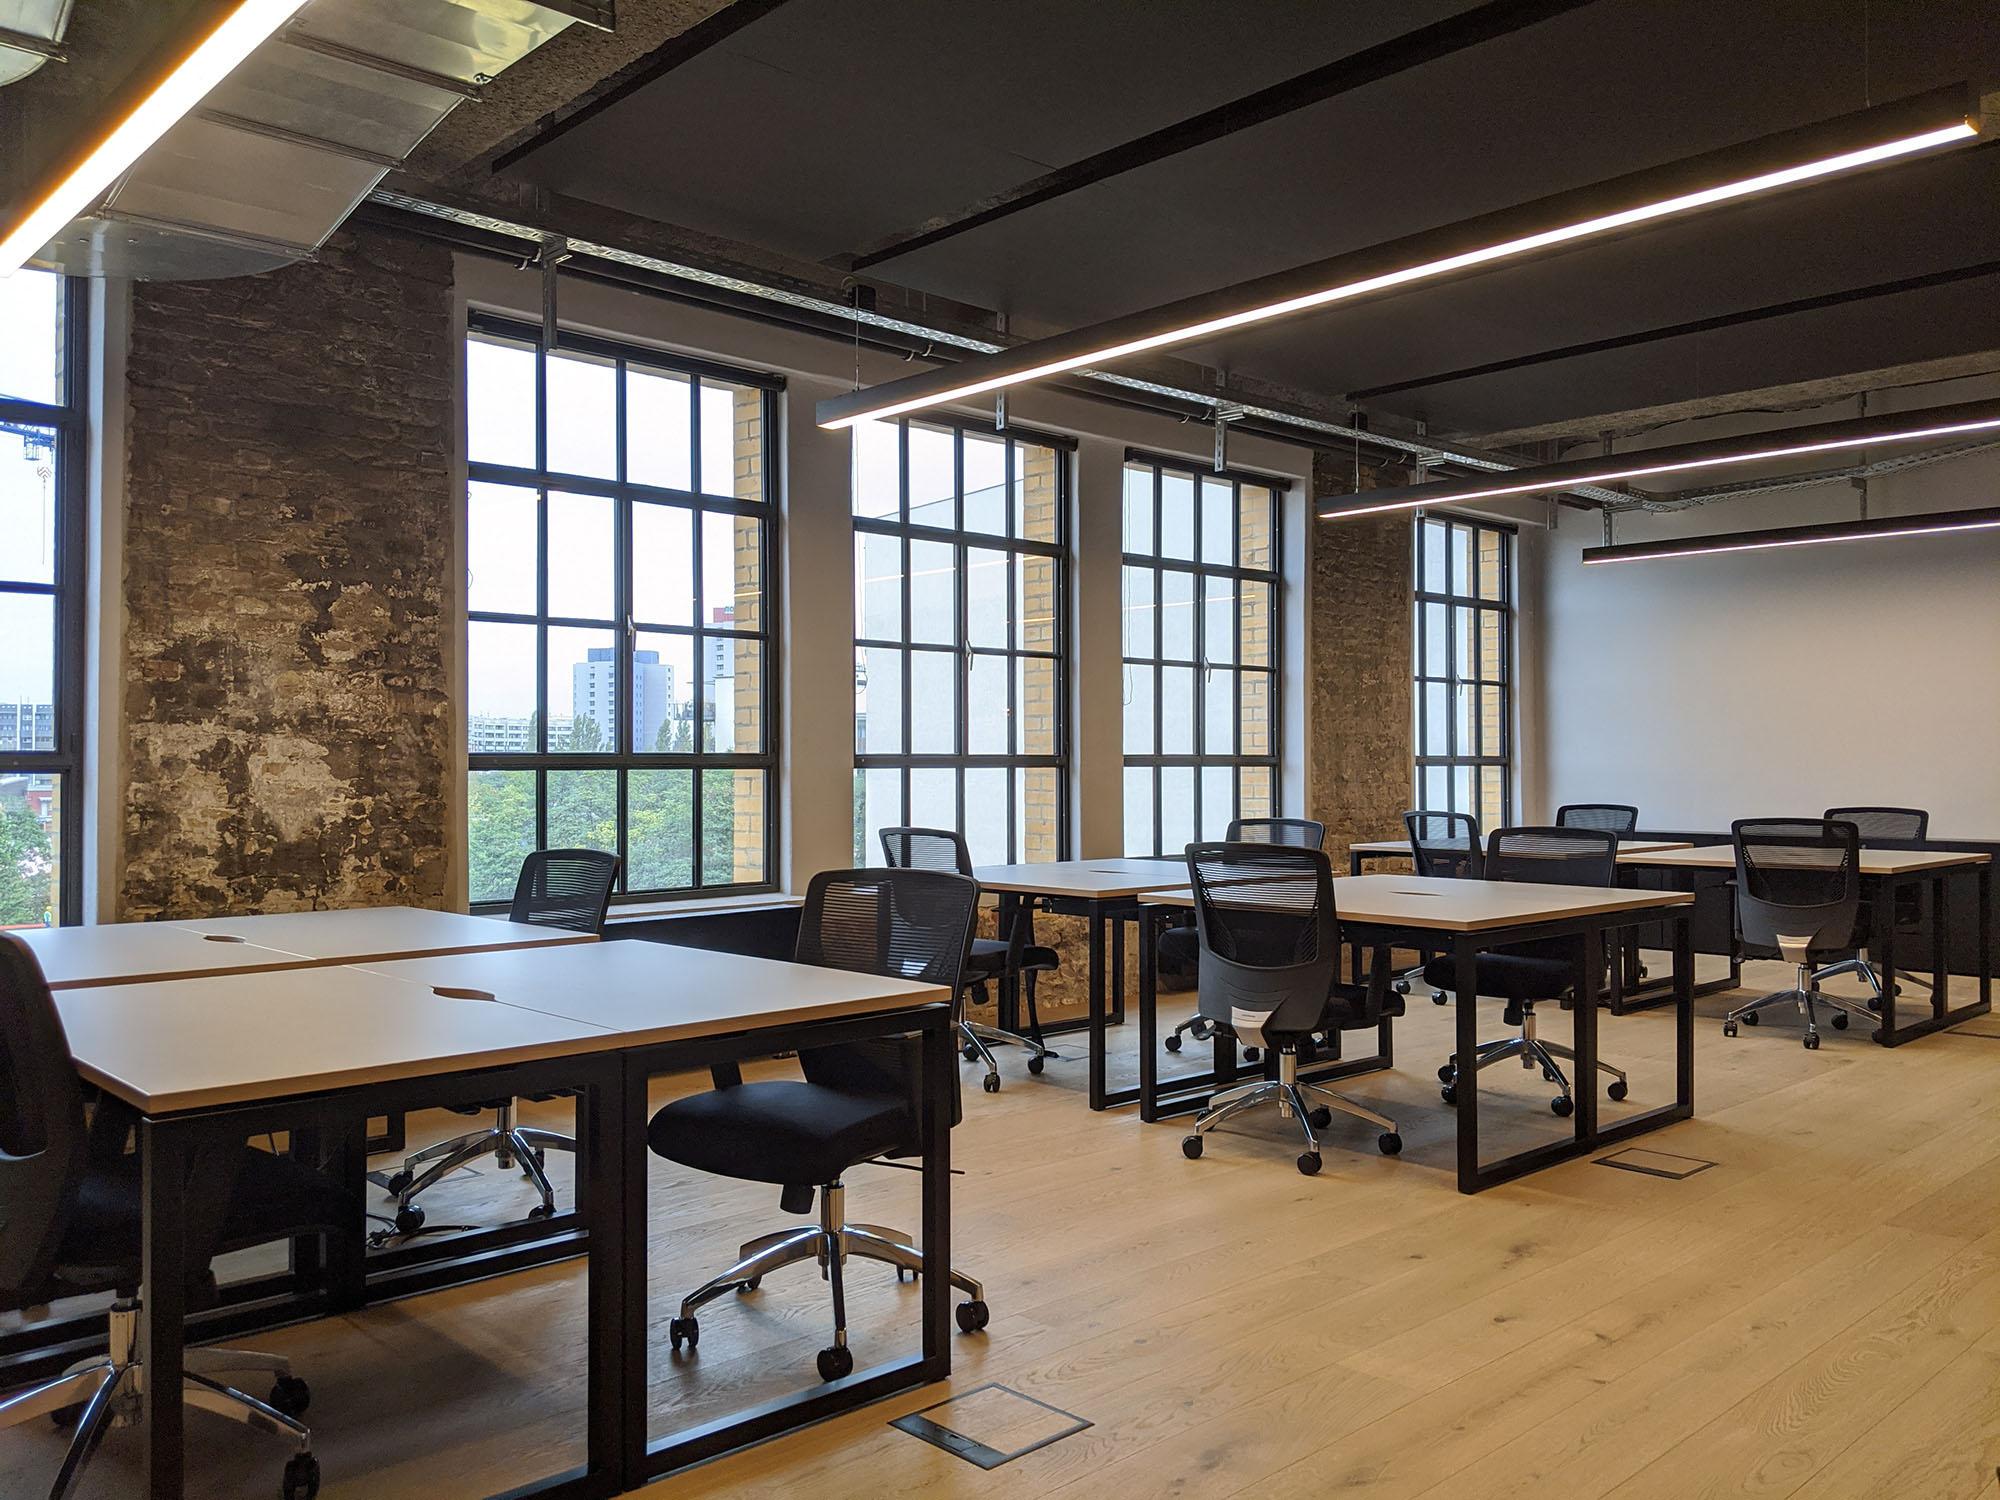 26 person workspace